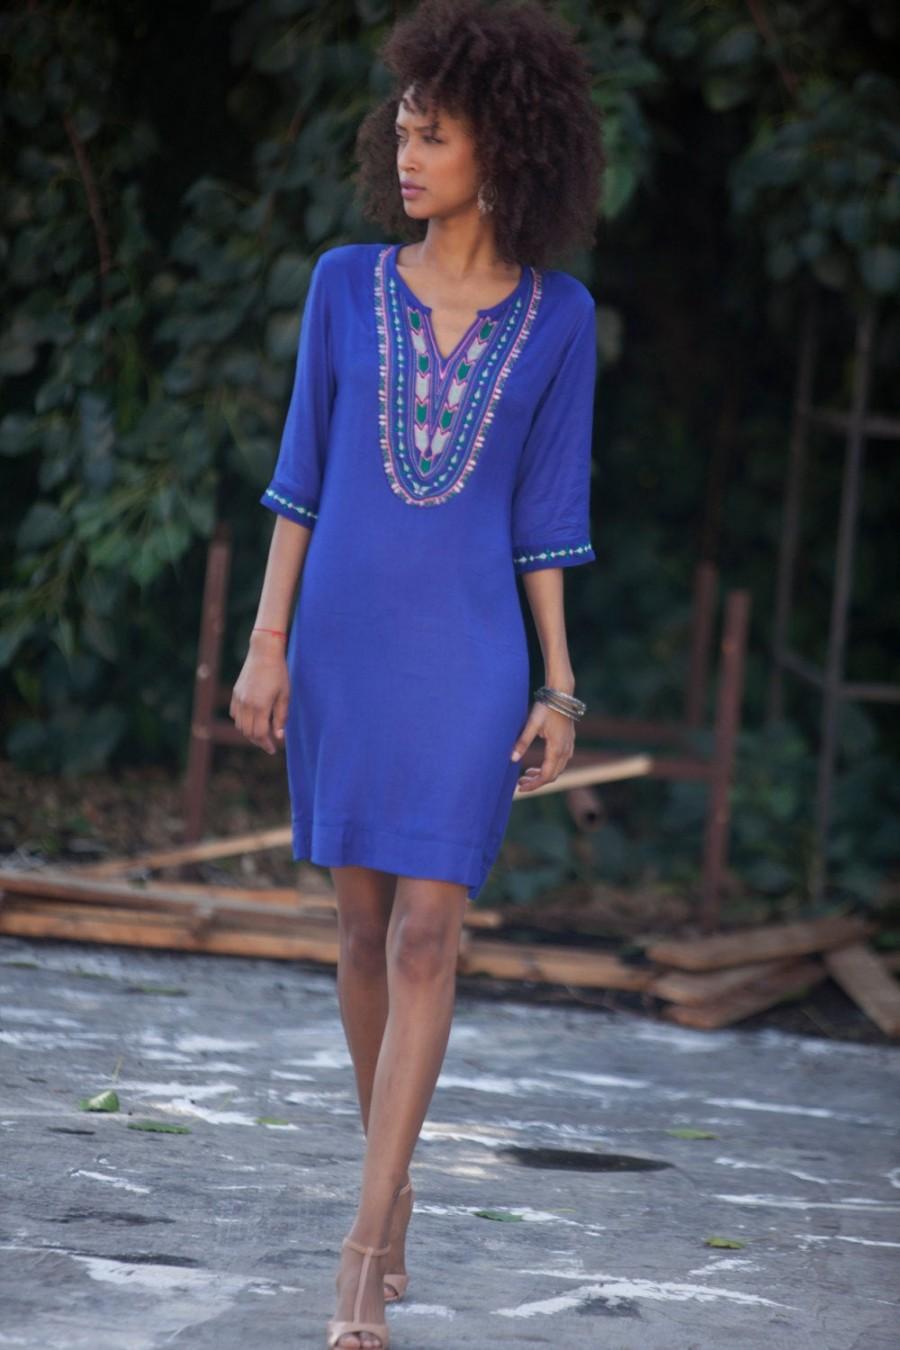 زفاف - Royal Blue Embroidery Caftan Tunic dress, Fall Women Caftan Long sleeves dress, Boho Summer dress, loose Tribal Ethnic Dress